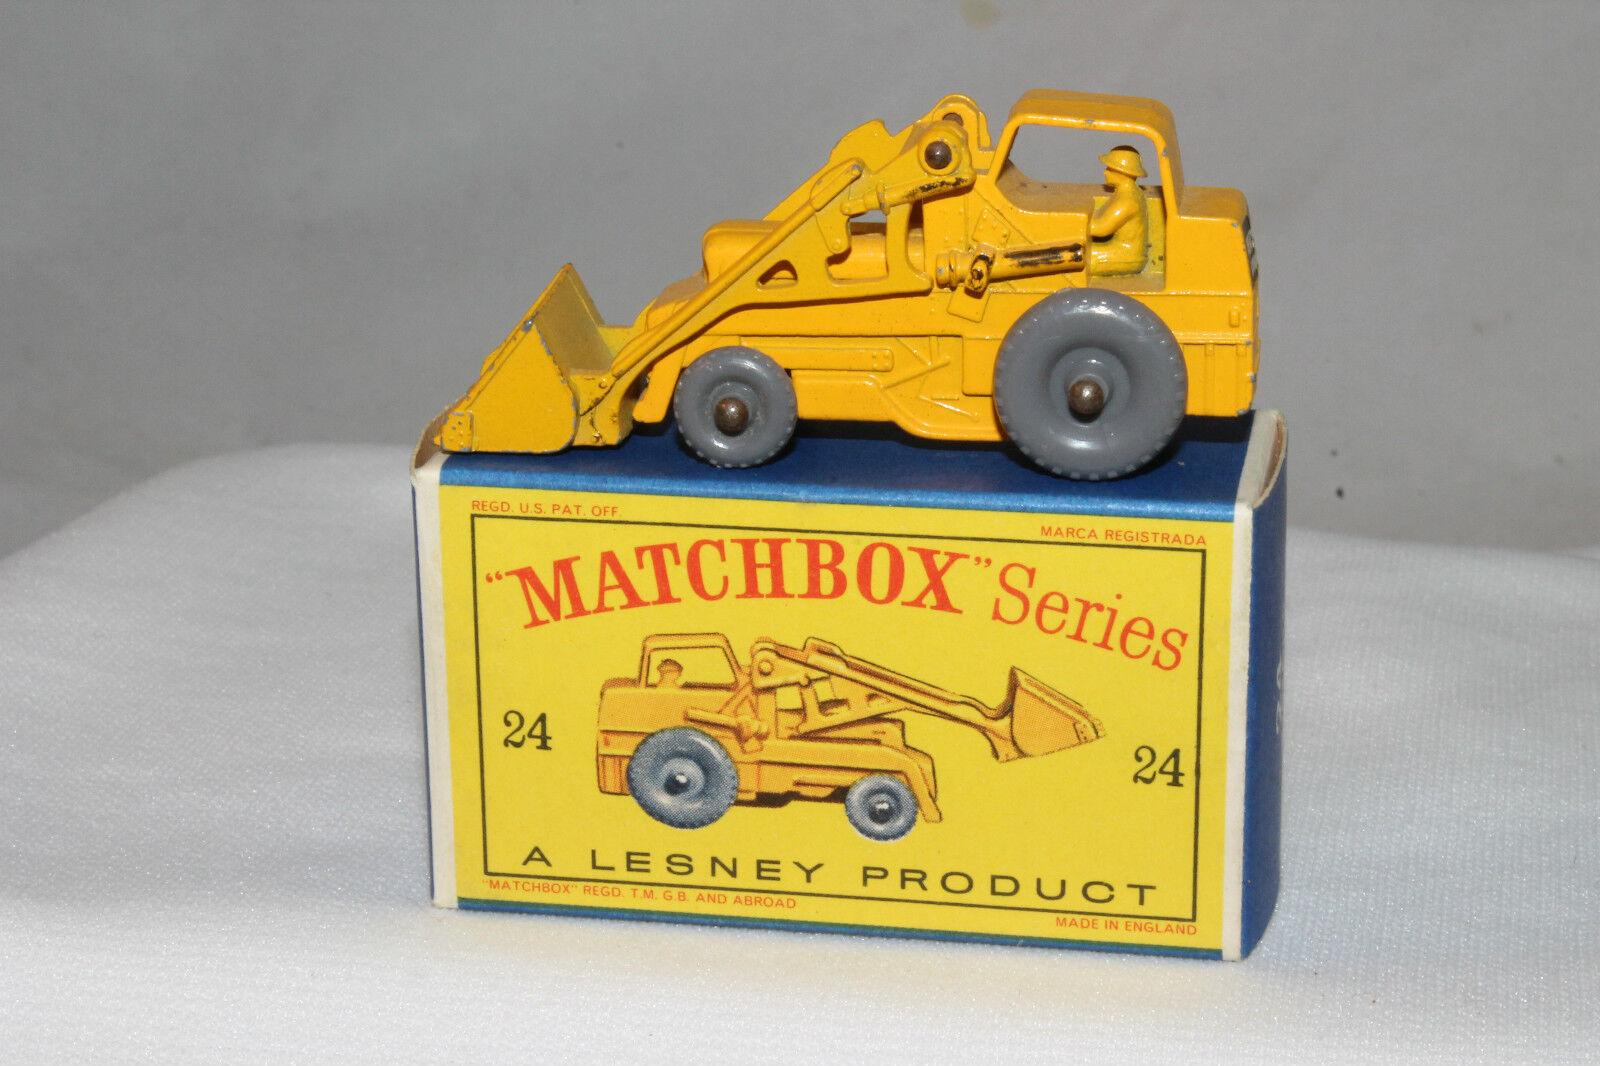 conveniente Matchbox Matchbox Matchbox   24b Weatherhill Hydraulic Excavadora, Gpw, prensado, Niza, En Caja Tipo D  encuentra tu favorito aquí